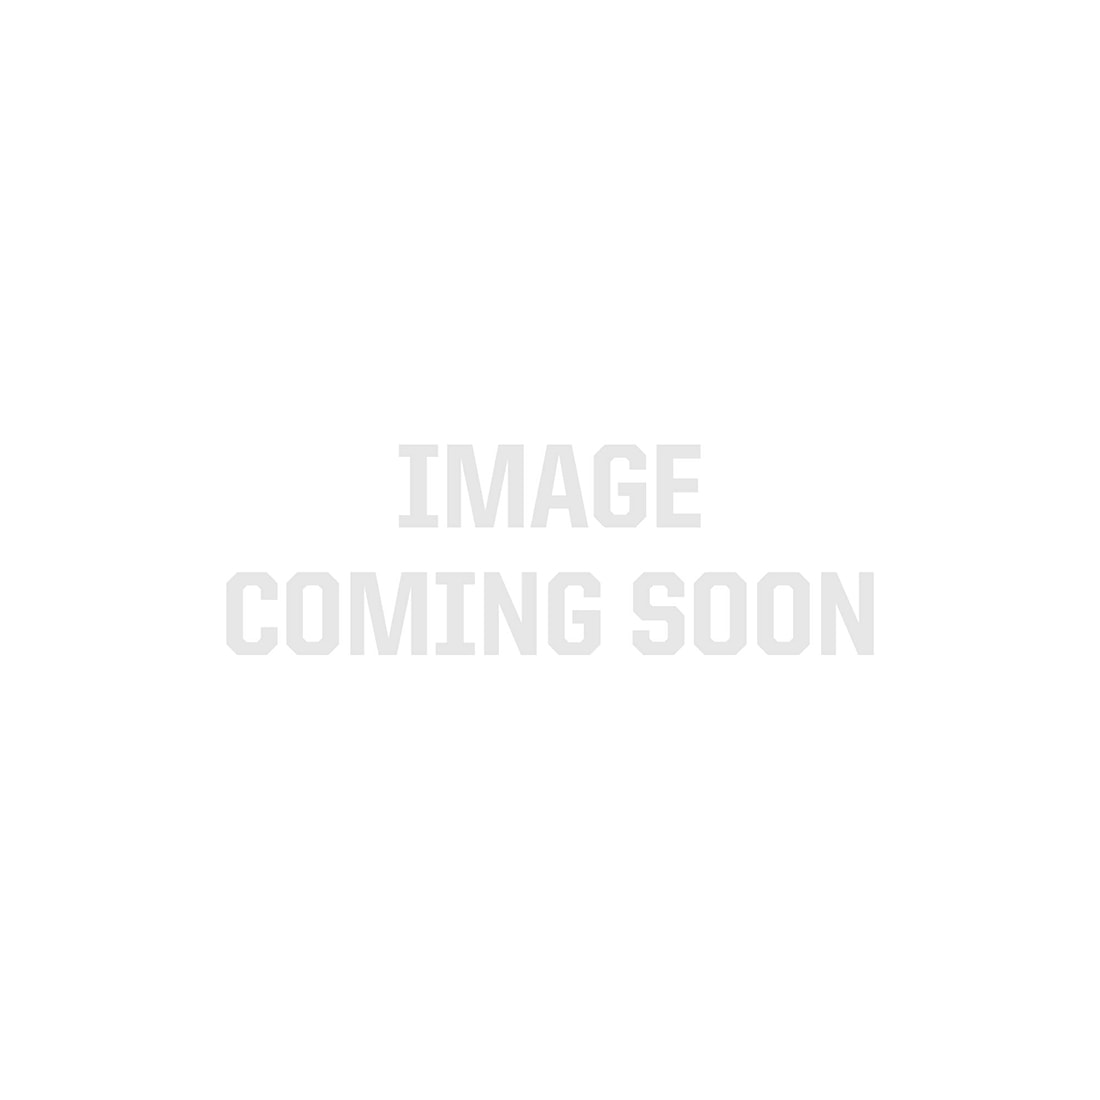 Amber 2835 CurrentControl Bendable ZigZag LED Strip Light, 60/m, 8mm wide, Sample Kit